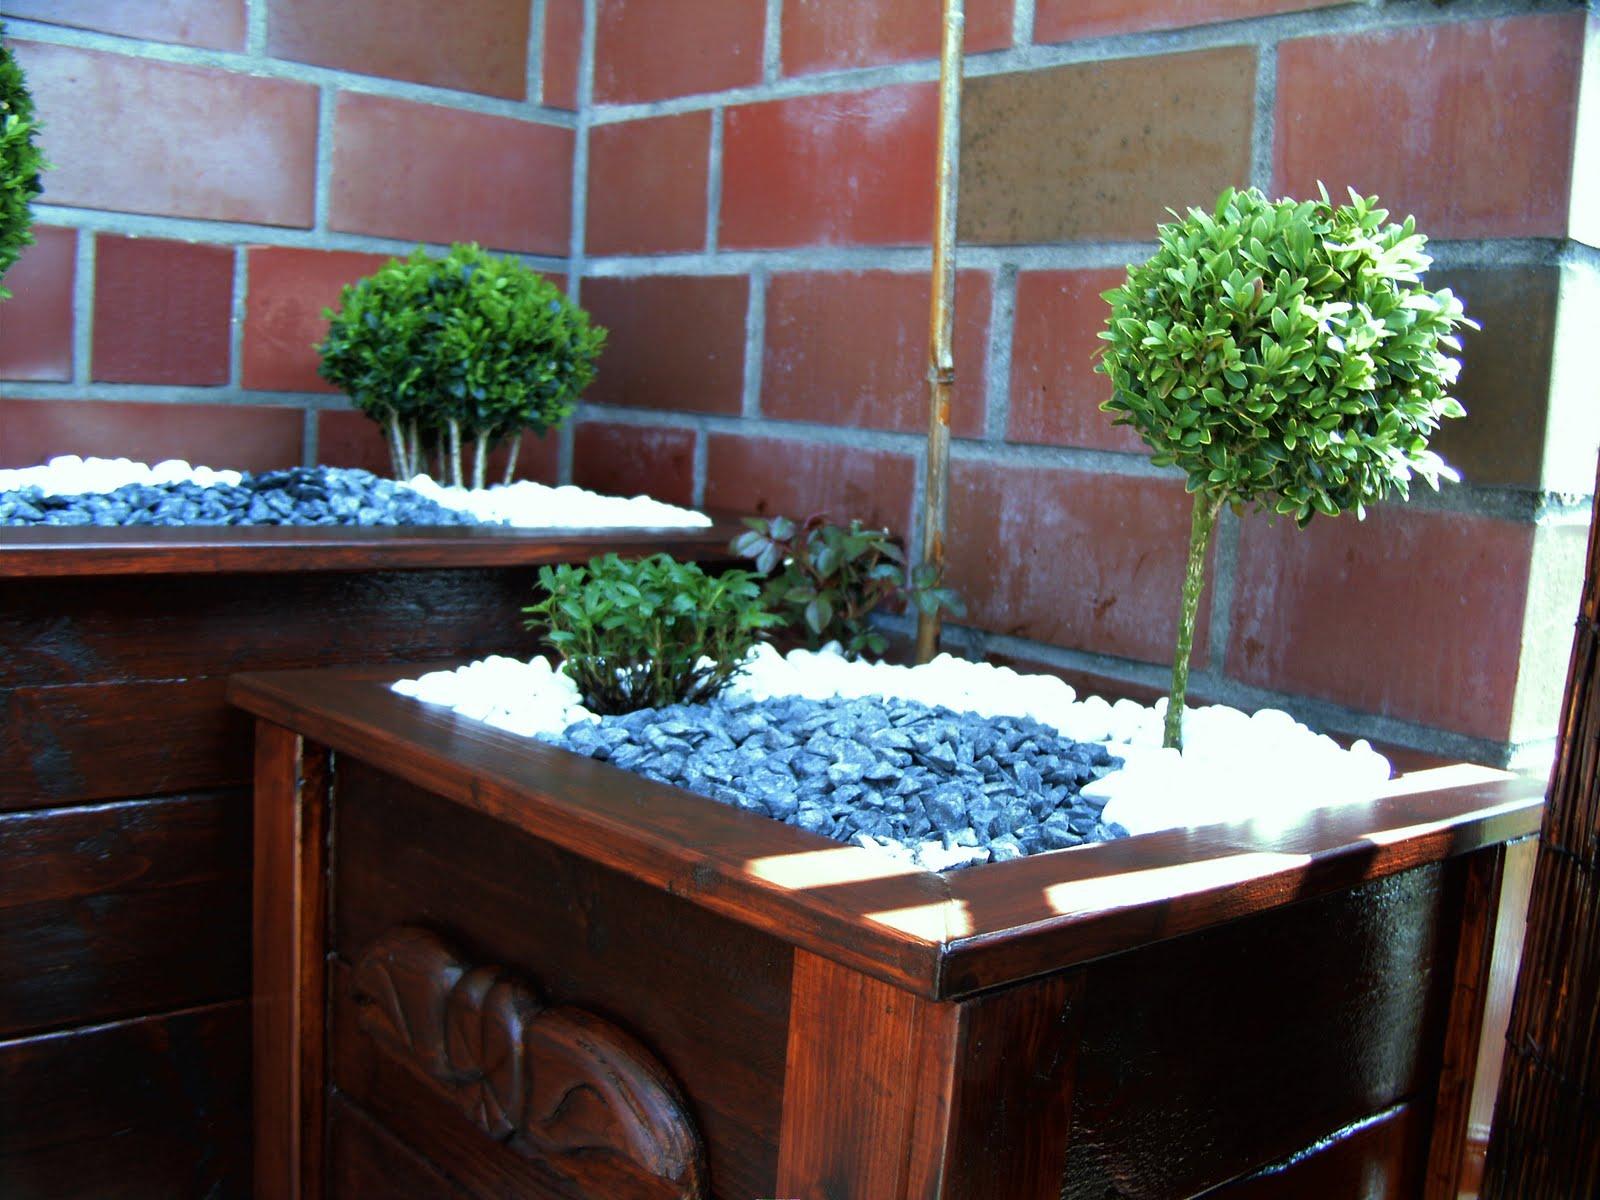 seelenreise befreiende kunst projekt zen garten teil 2. Black Bedroom Furniture Sets. Home Design Ideas